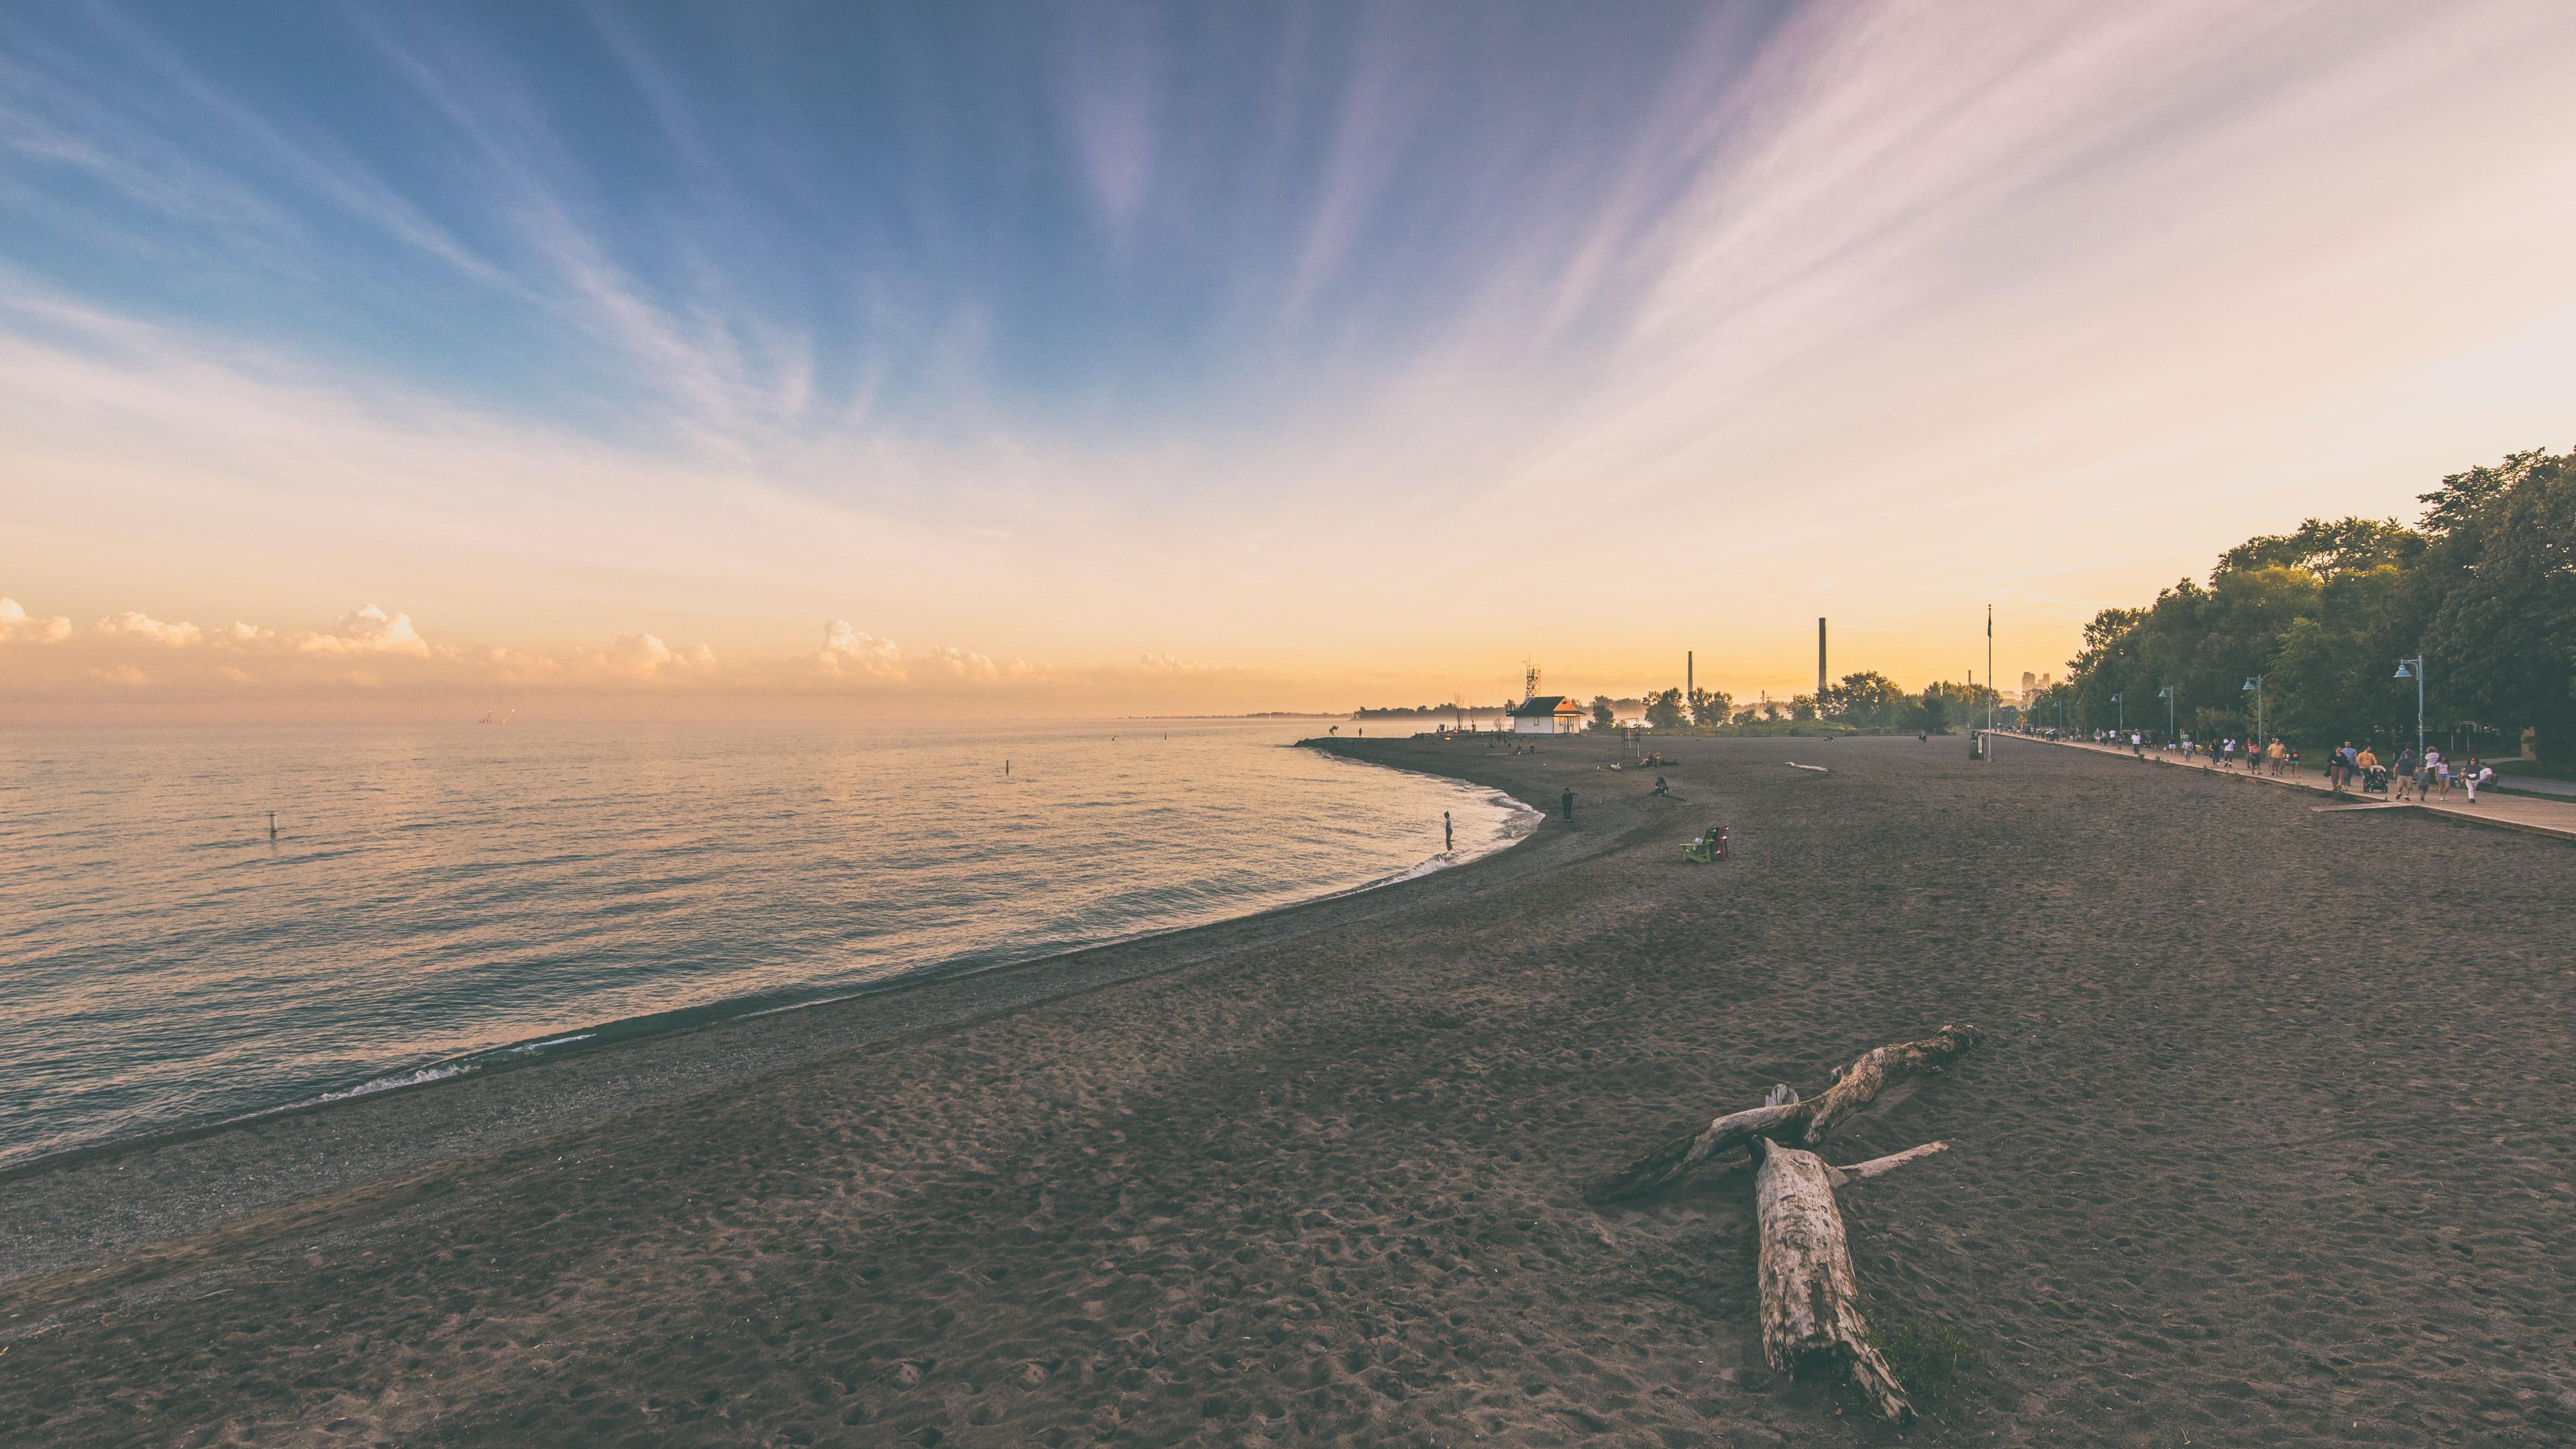 Beach Sunset Toronto Nature Landscape Sand Water Ocean View Water Ripples Coast Coastline Filter Fil 3840x2160